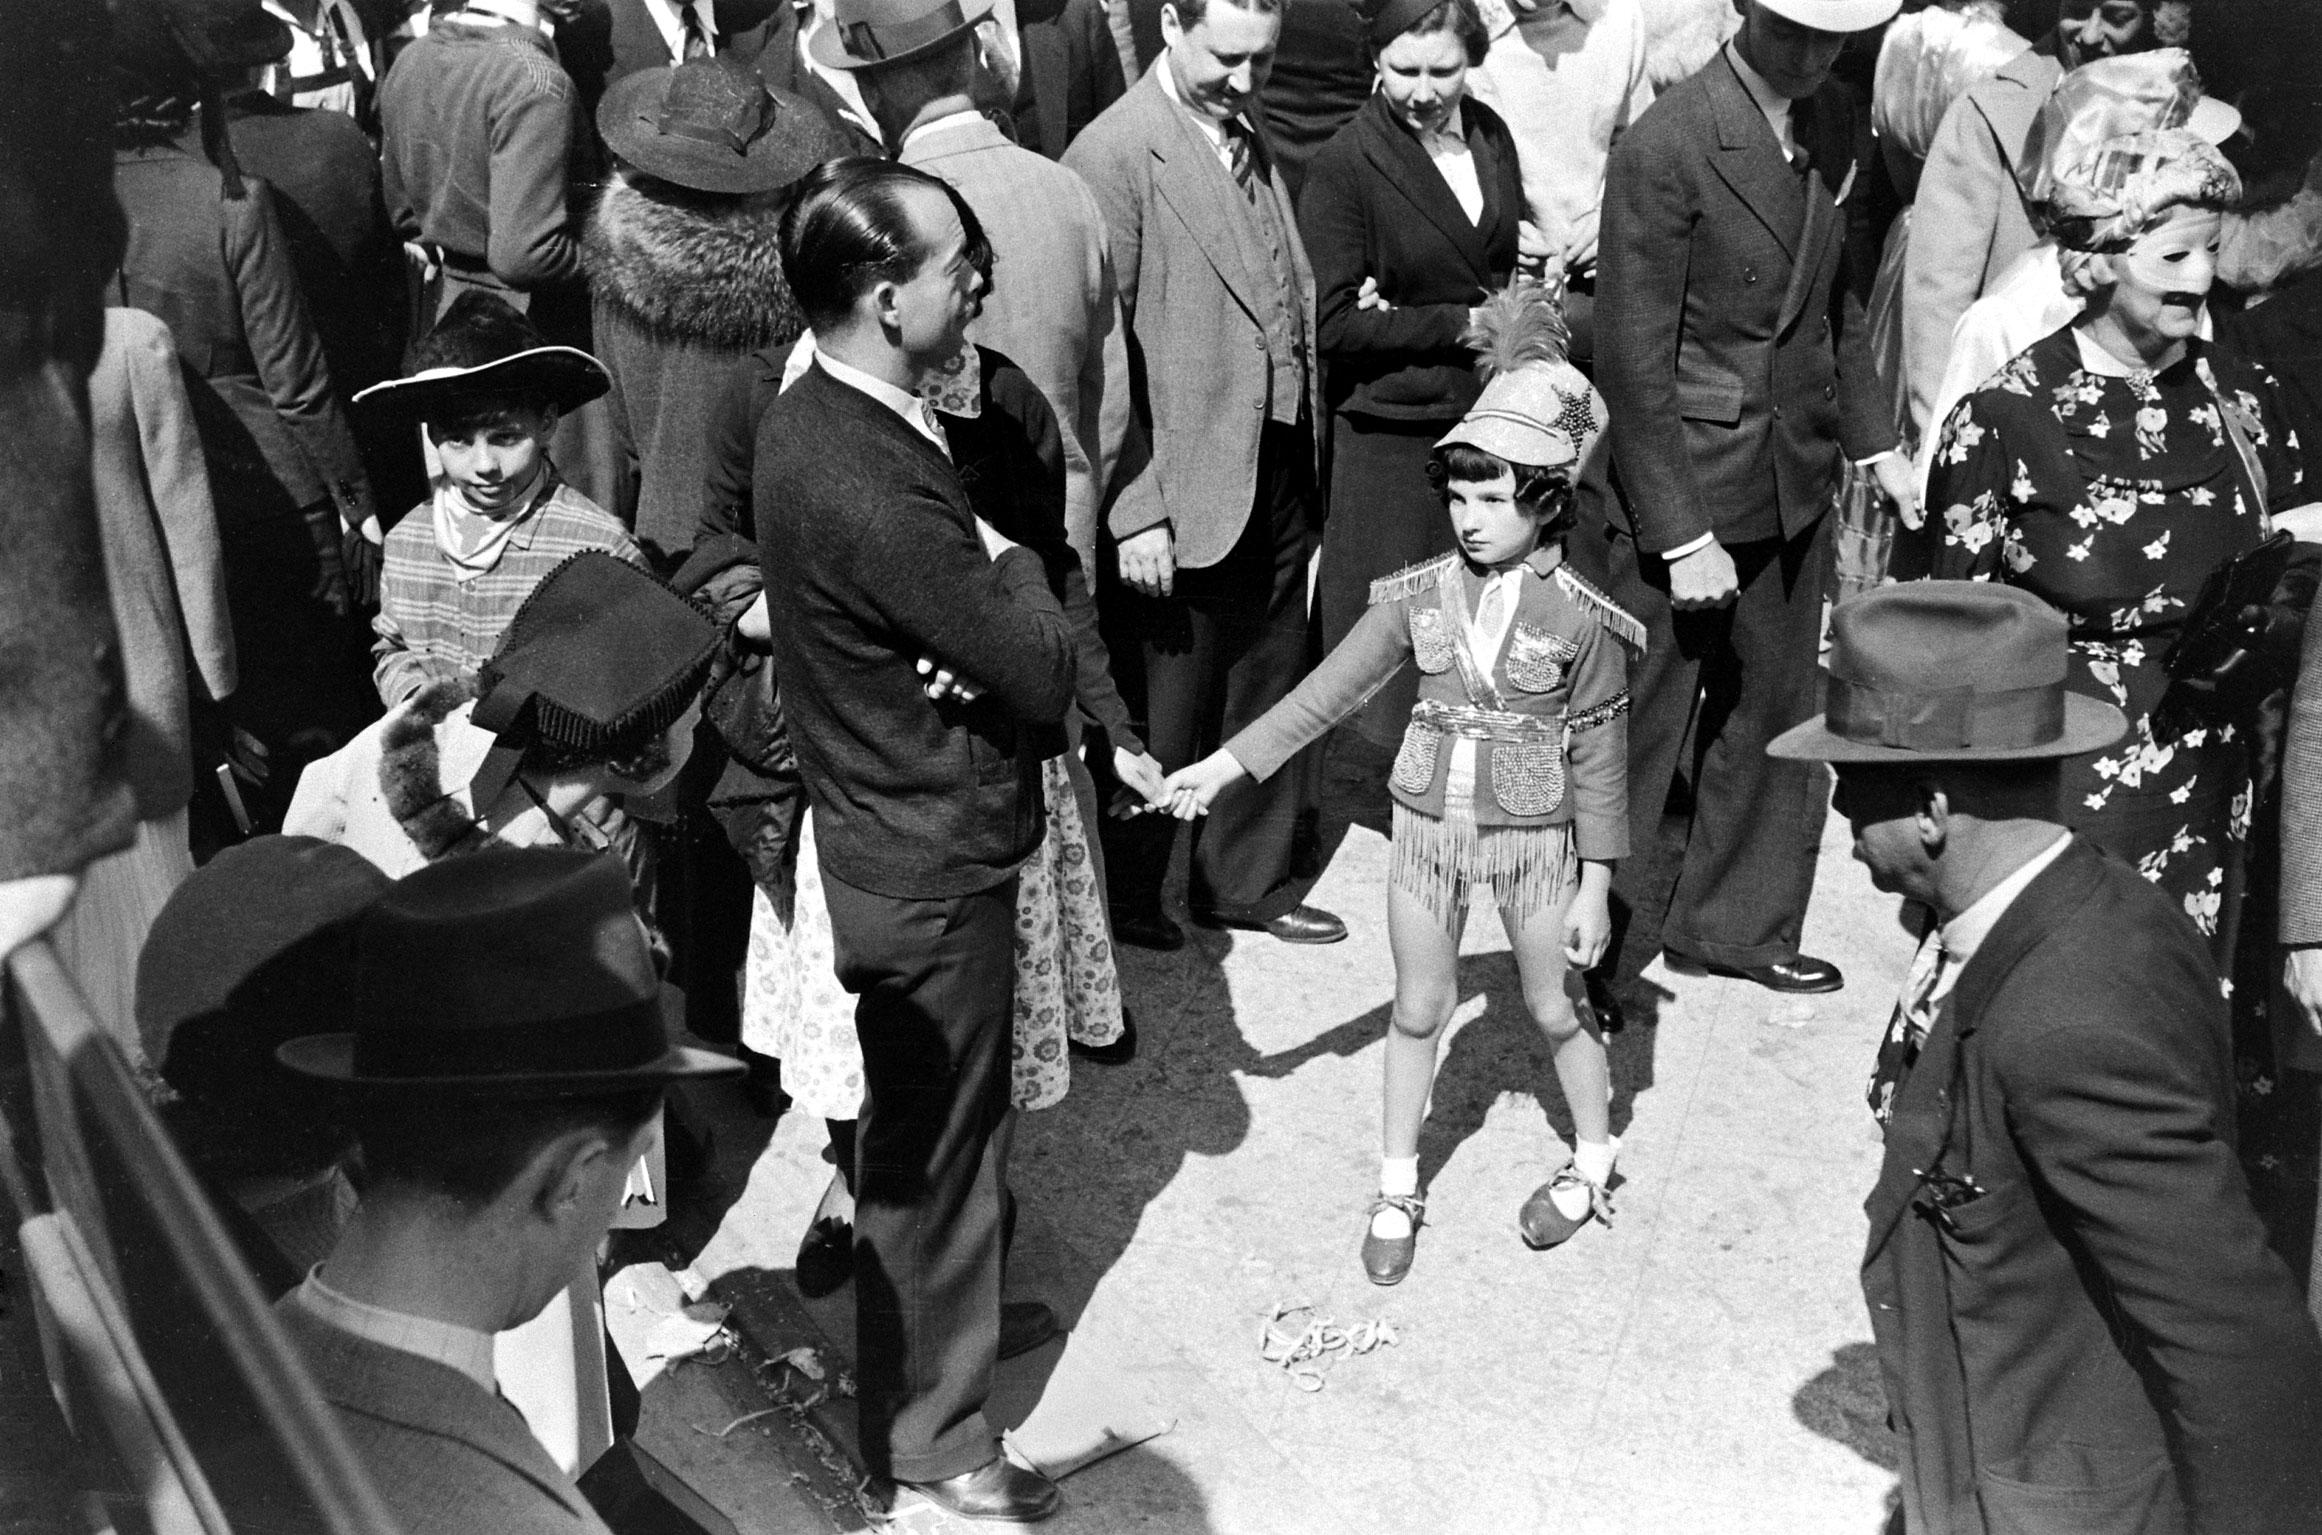 Mardi Gras, New Orleans, 1938.